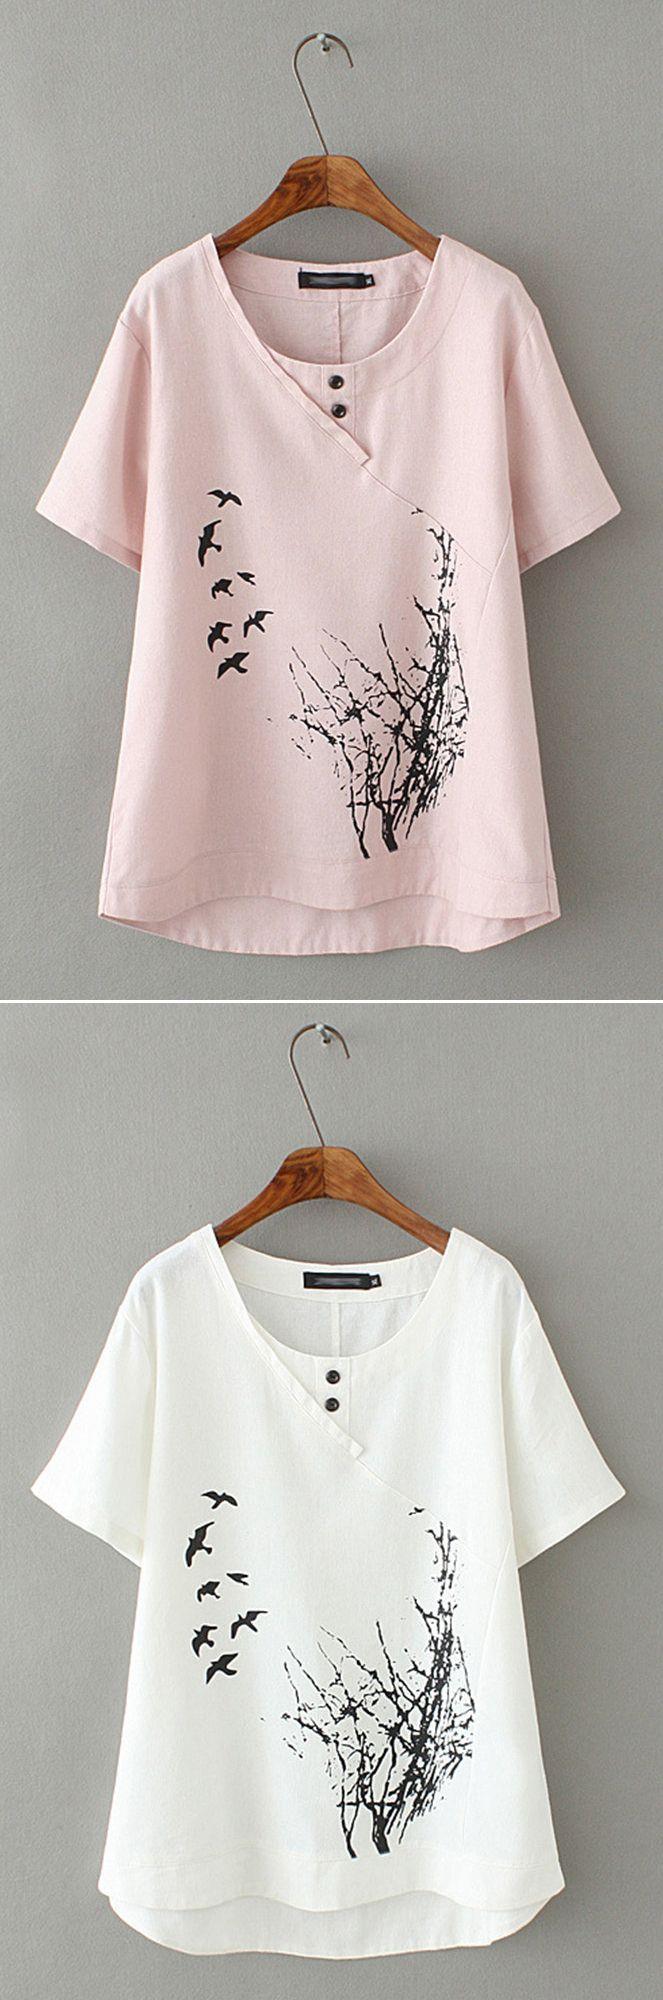 340c281d73c Casual Printed Short Sleeve High-low Hem Shirt for Women  top  shirt ...